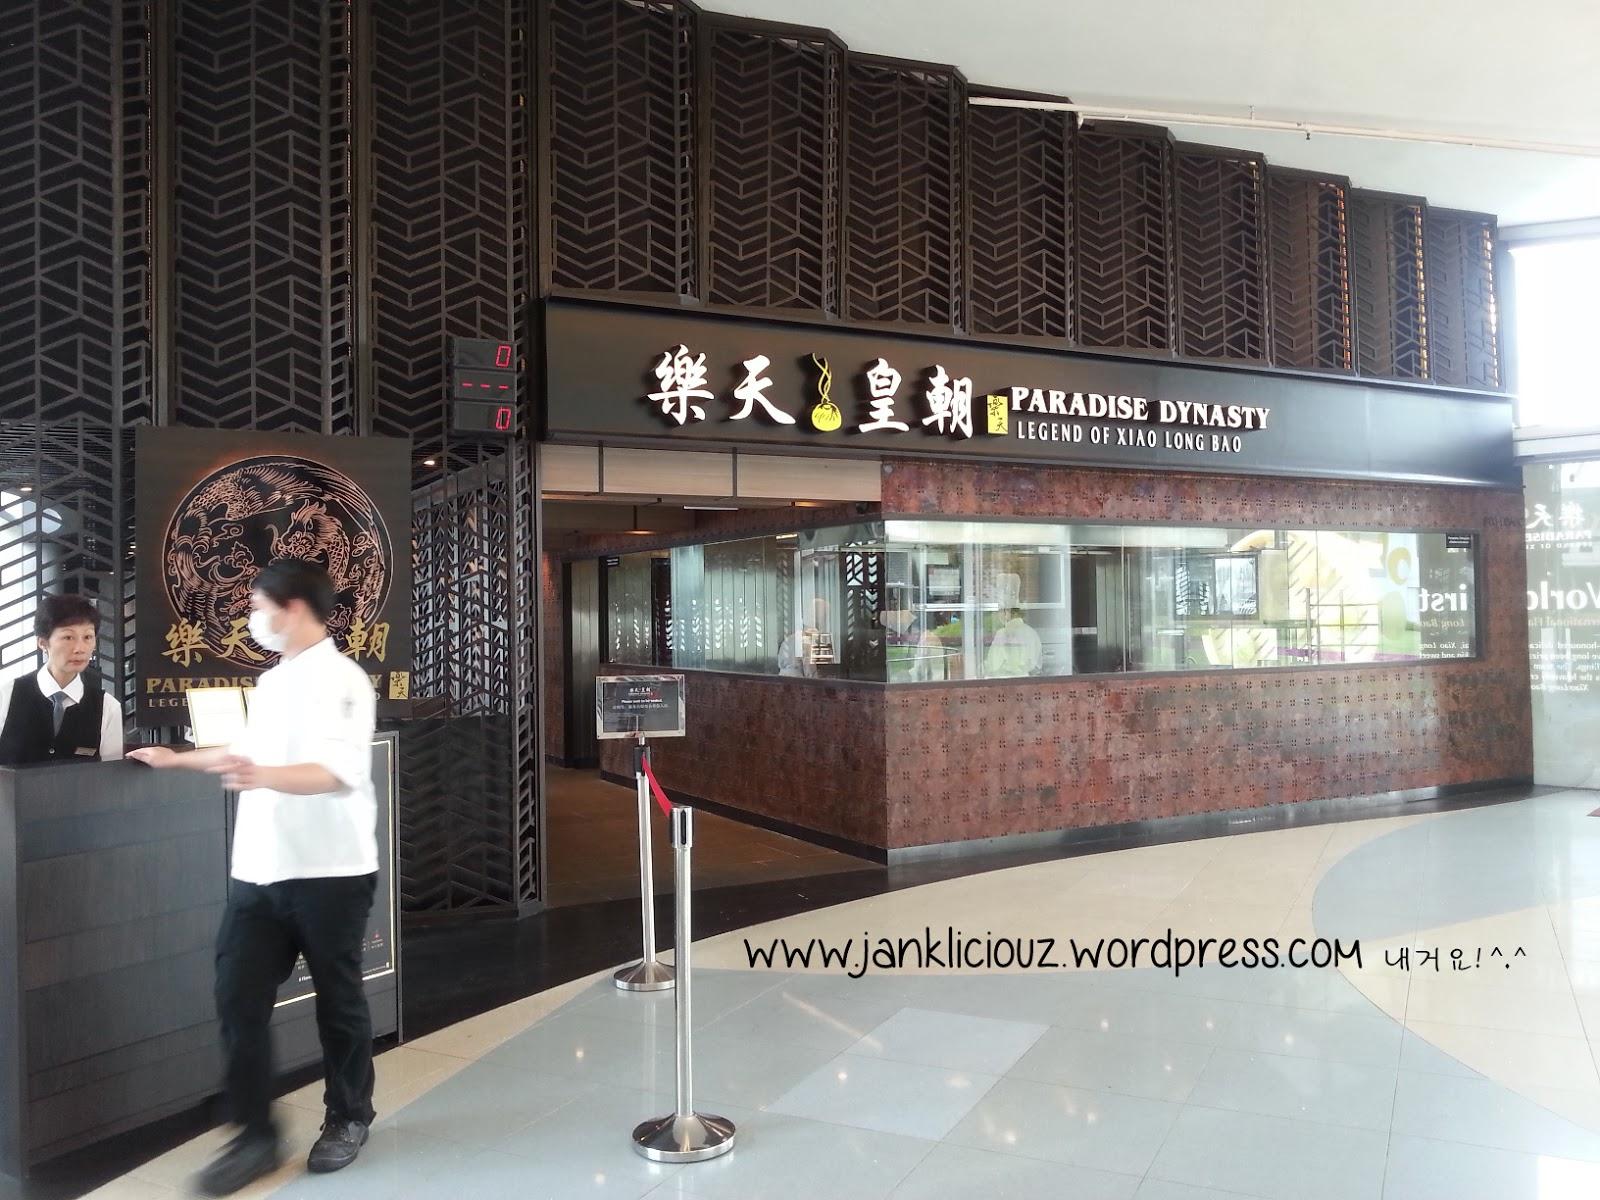 Xiao Long Bao (小笼包) Land: Paradise Dynasty (乐天皇朝)